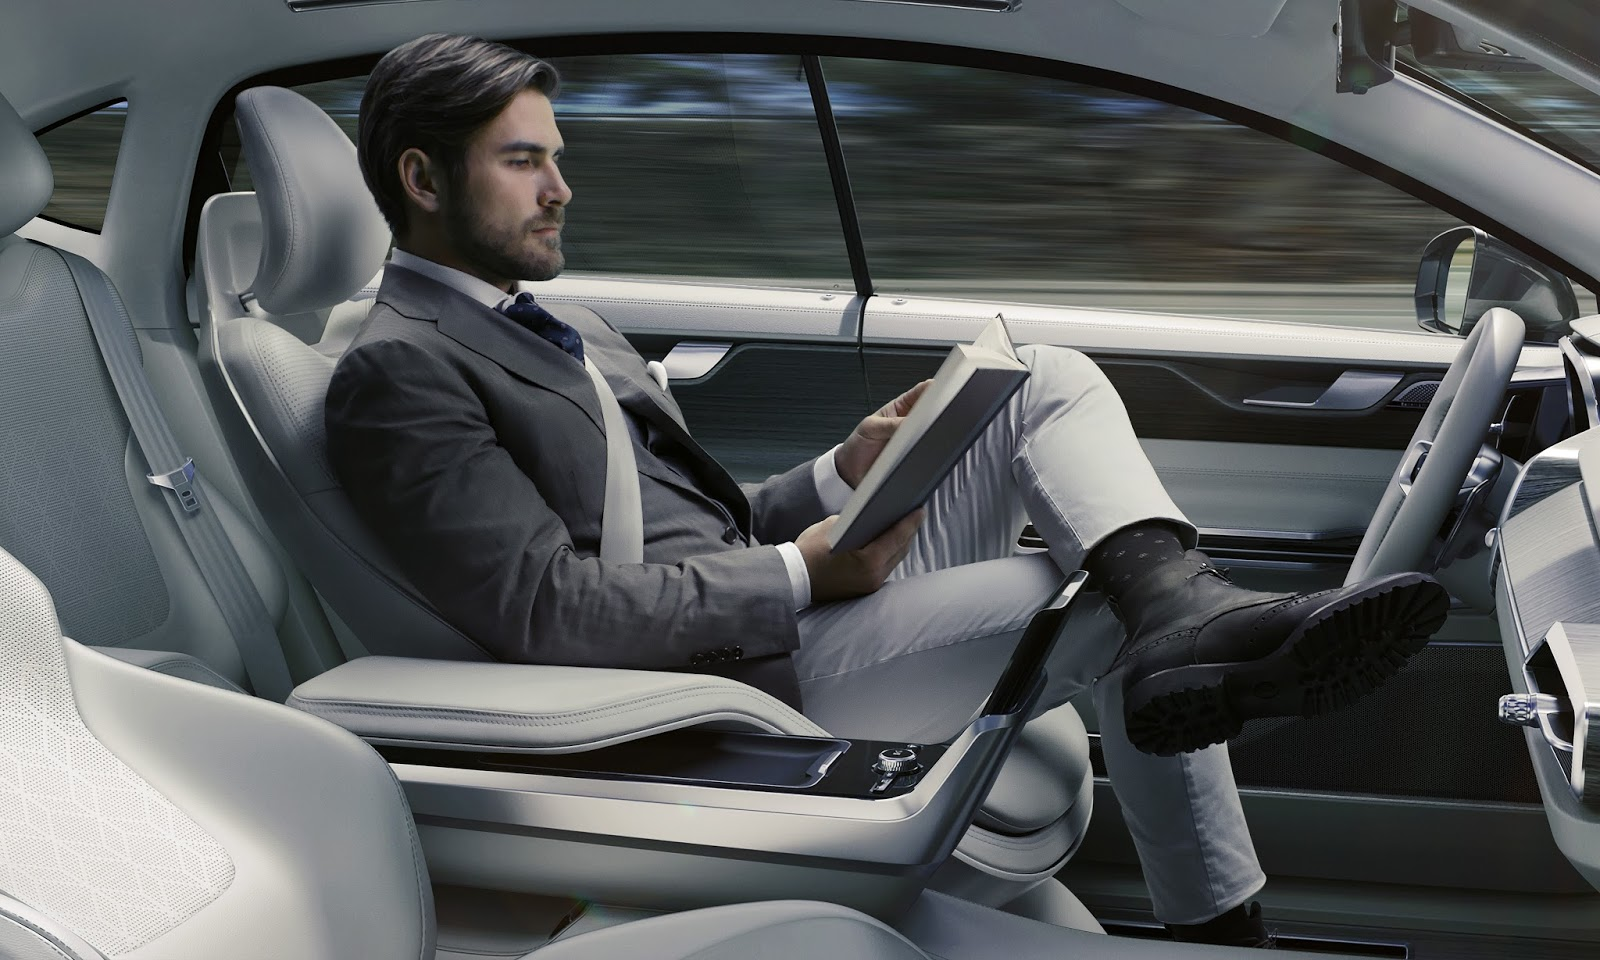 169545 Concept 26 Η Volvo θα κάνει και την αυτόνομη οδήγηση διασκεδαστική Autonomous Driving, Volvo, Volvo XC90, Αυτόνομη οδήγηση